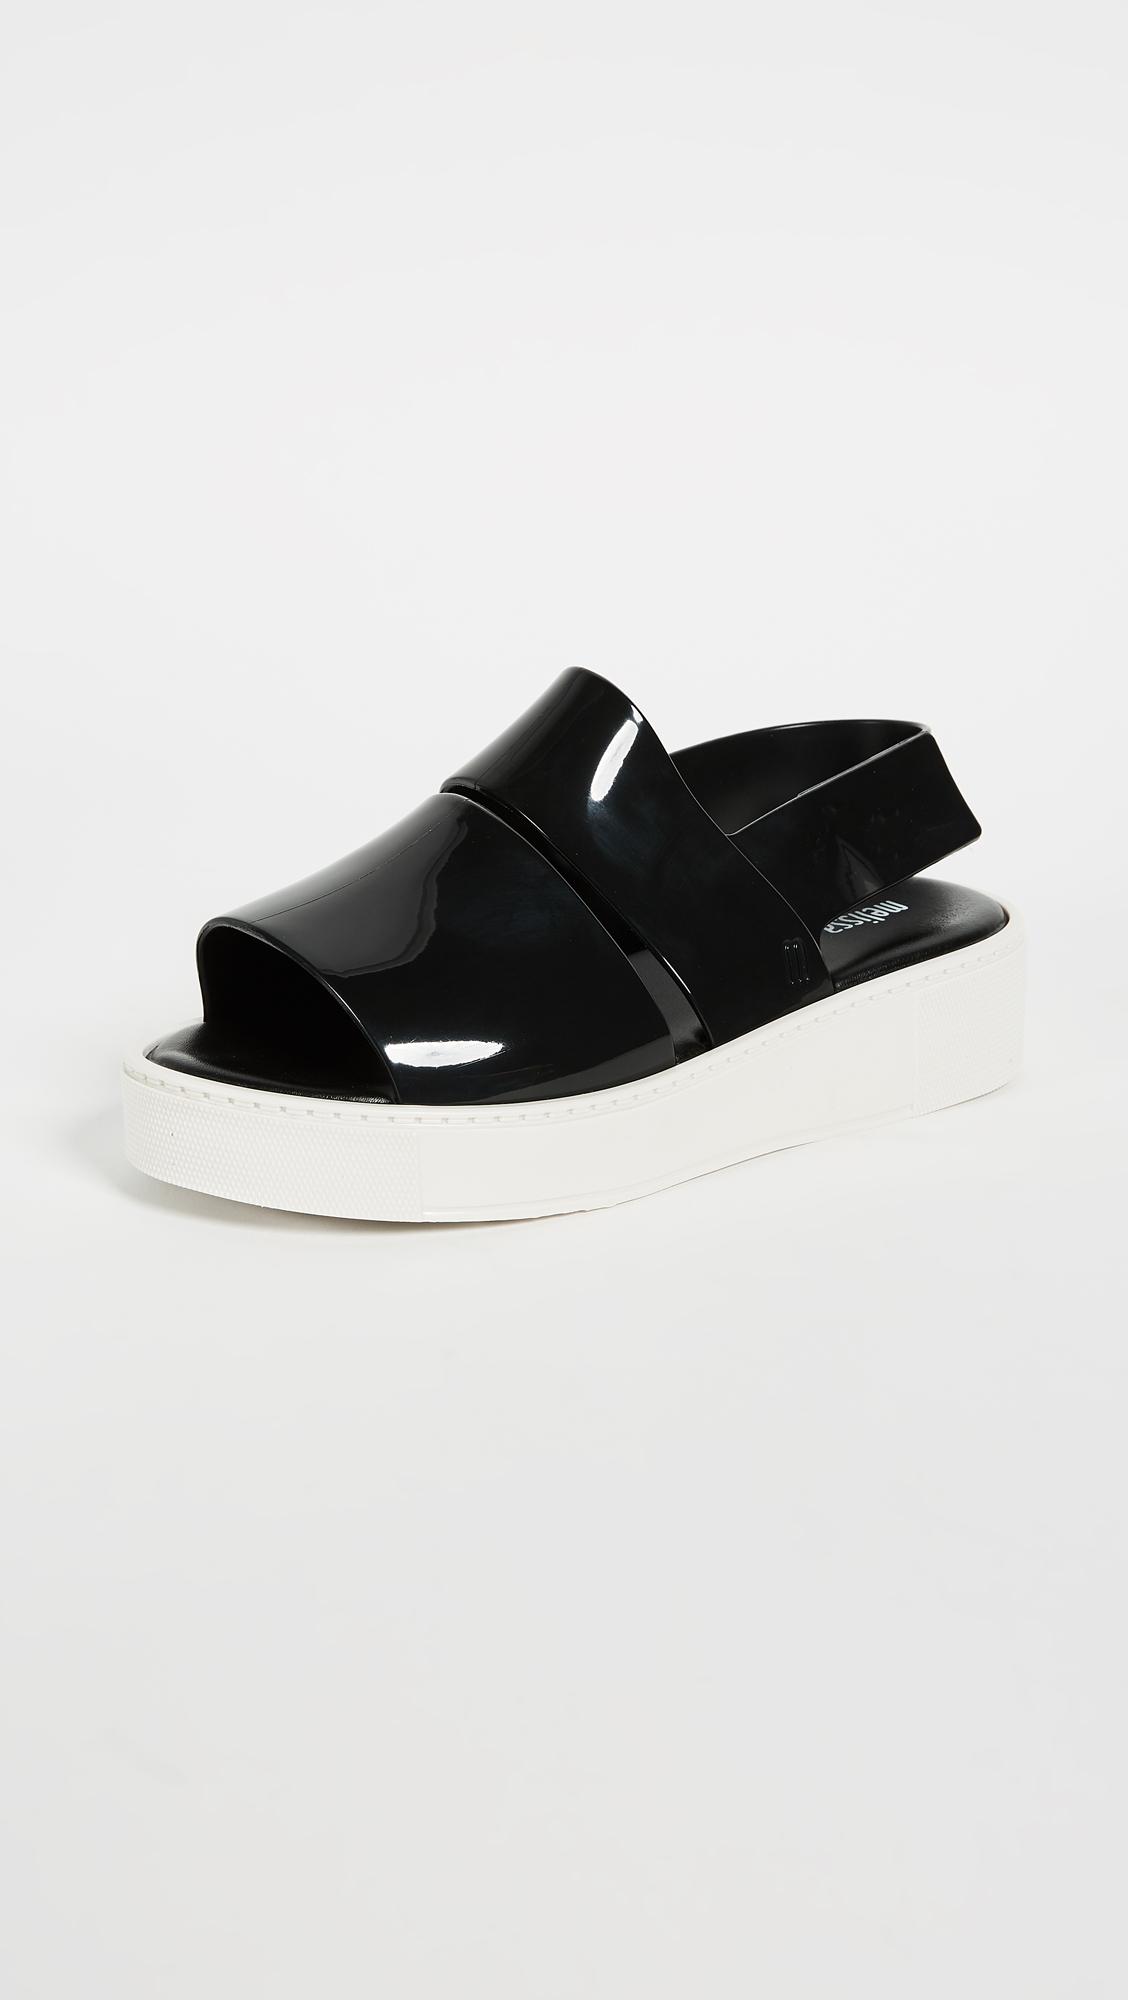 e164d10830b Melissa Soho Platform Sandals